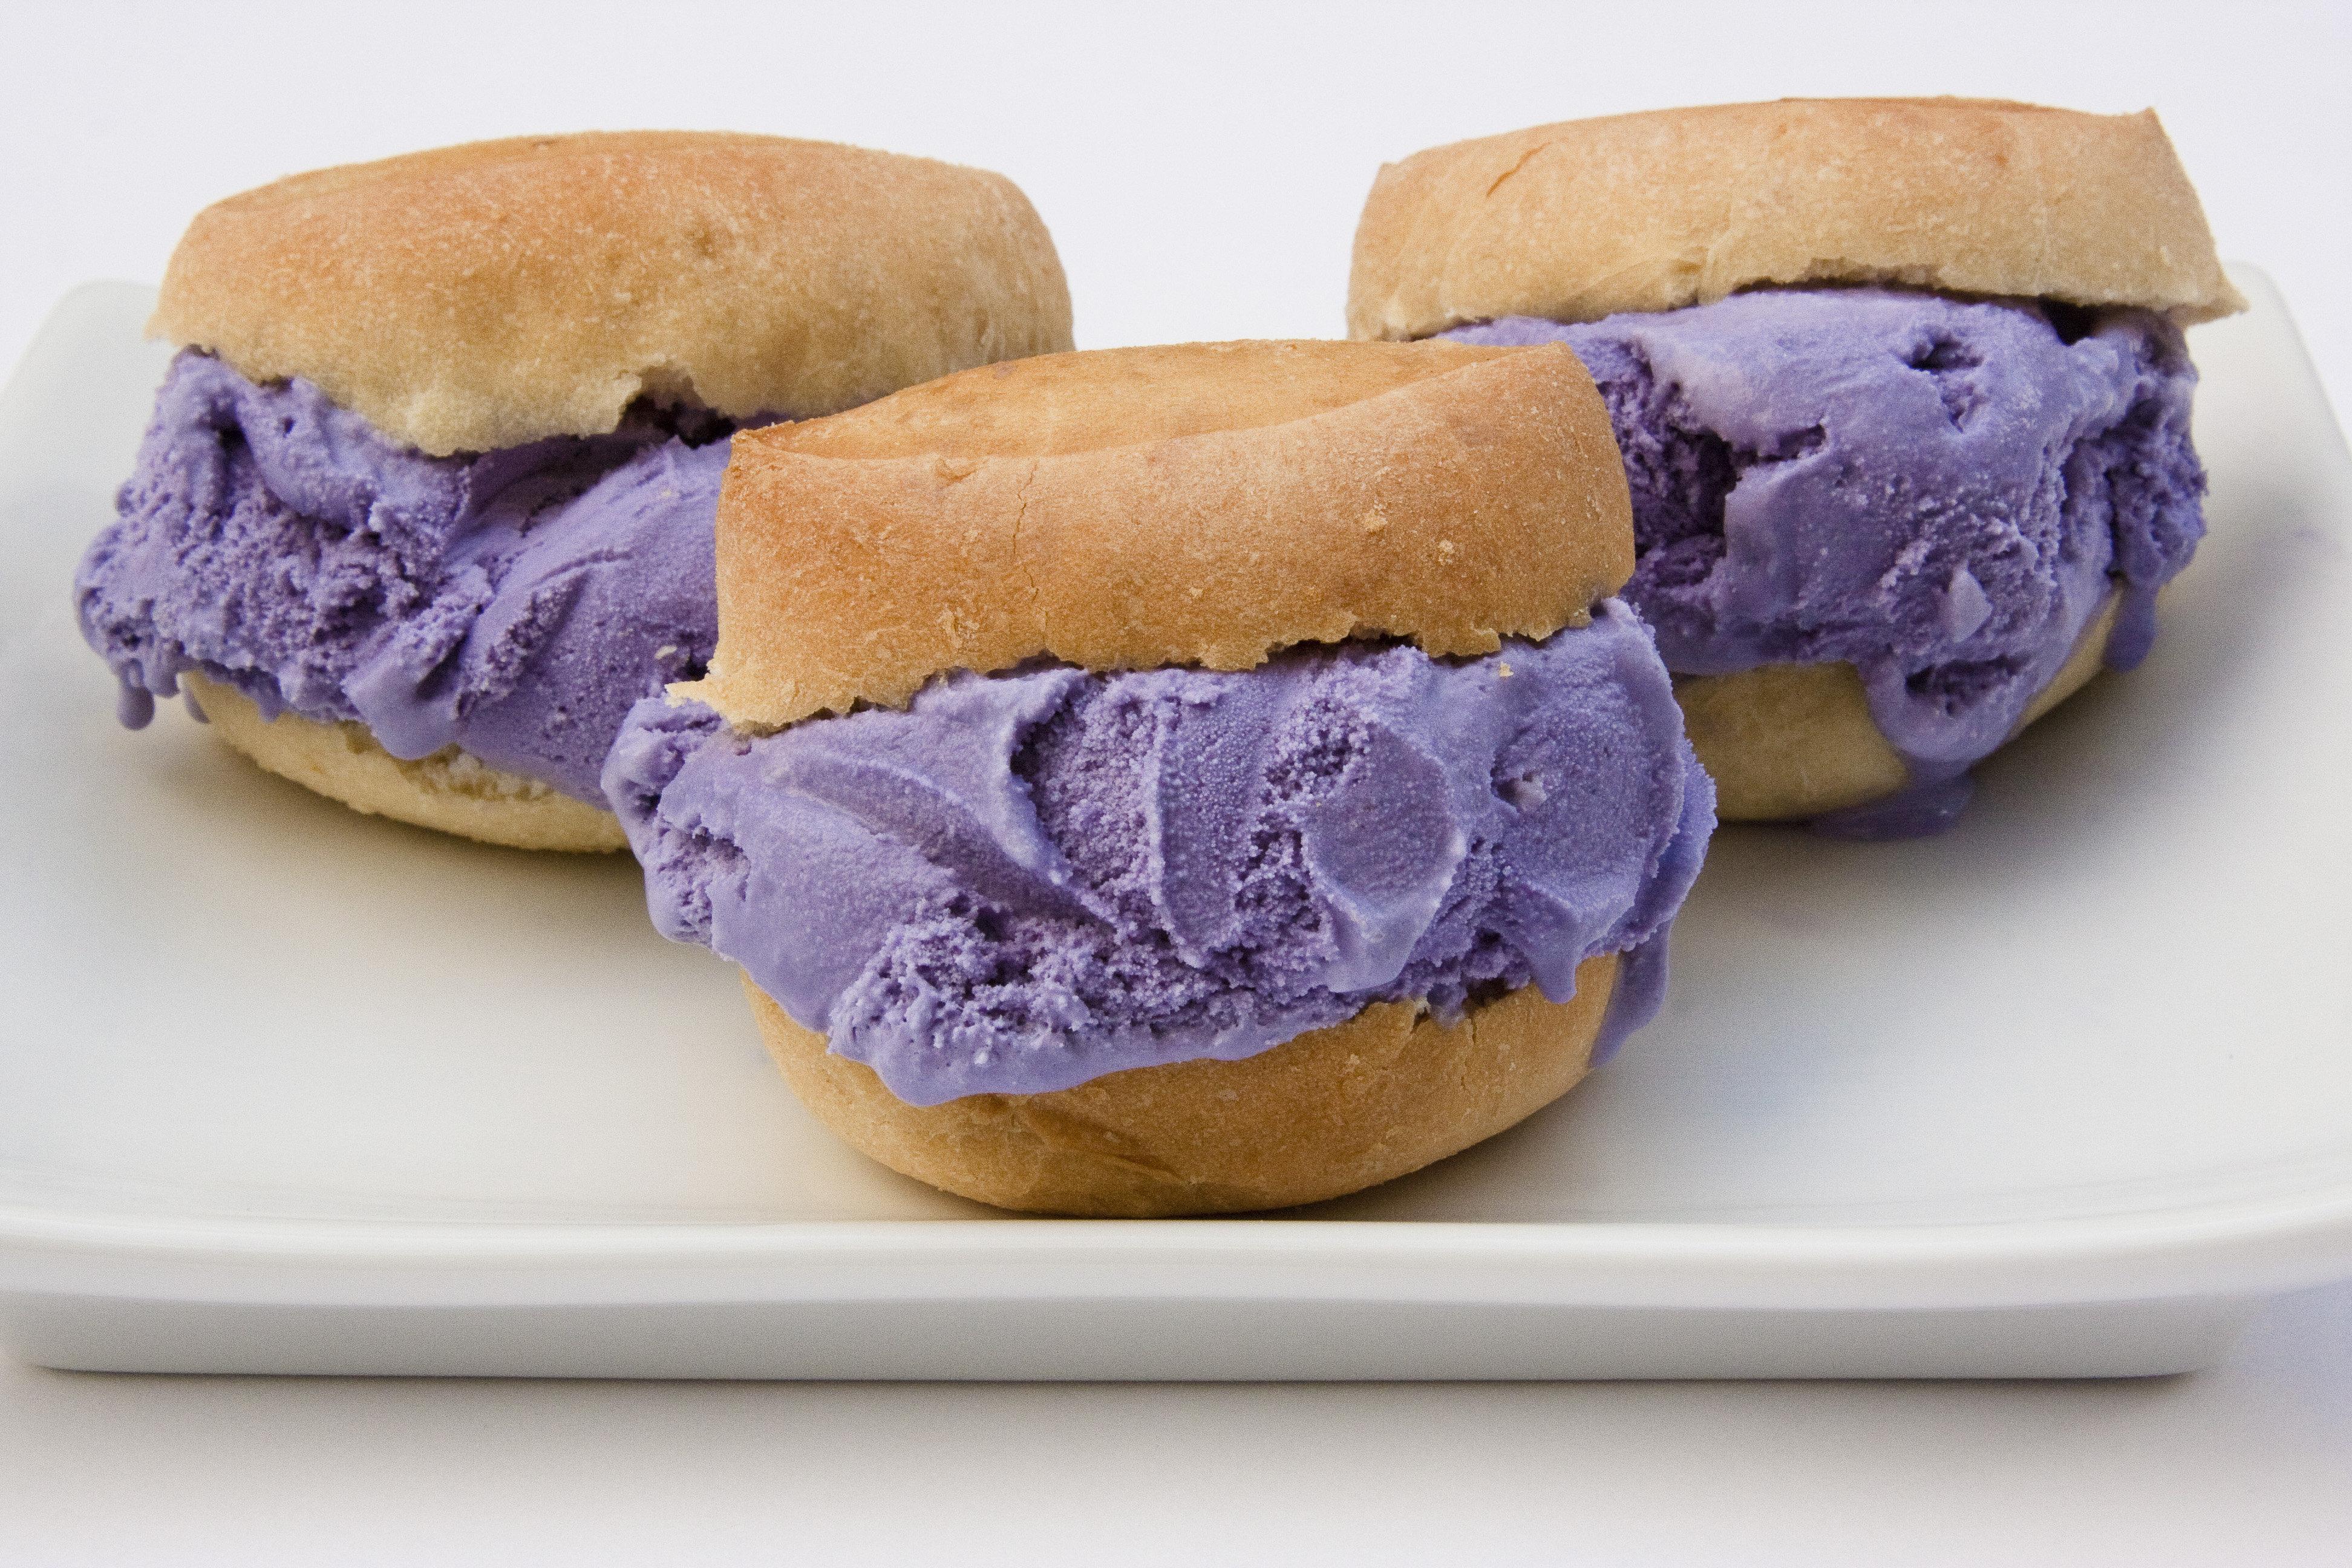 Ube ice cream or purple yam ice cream sandwiched in salt pan.